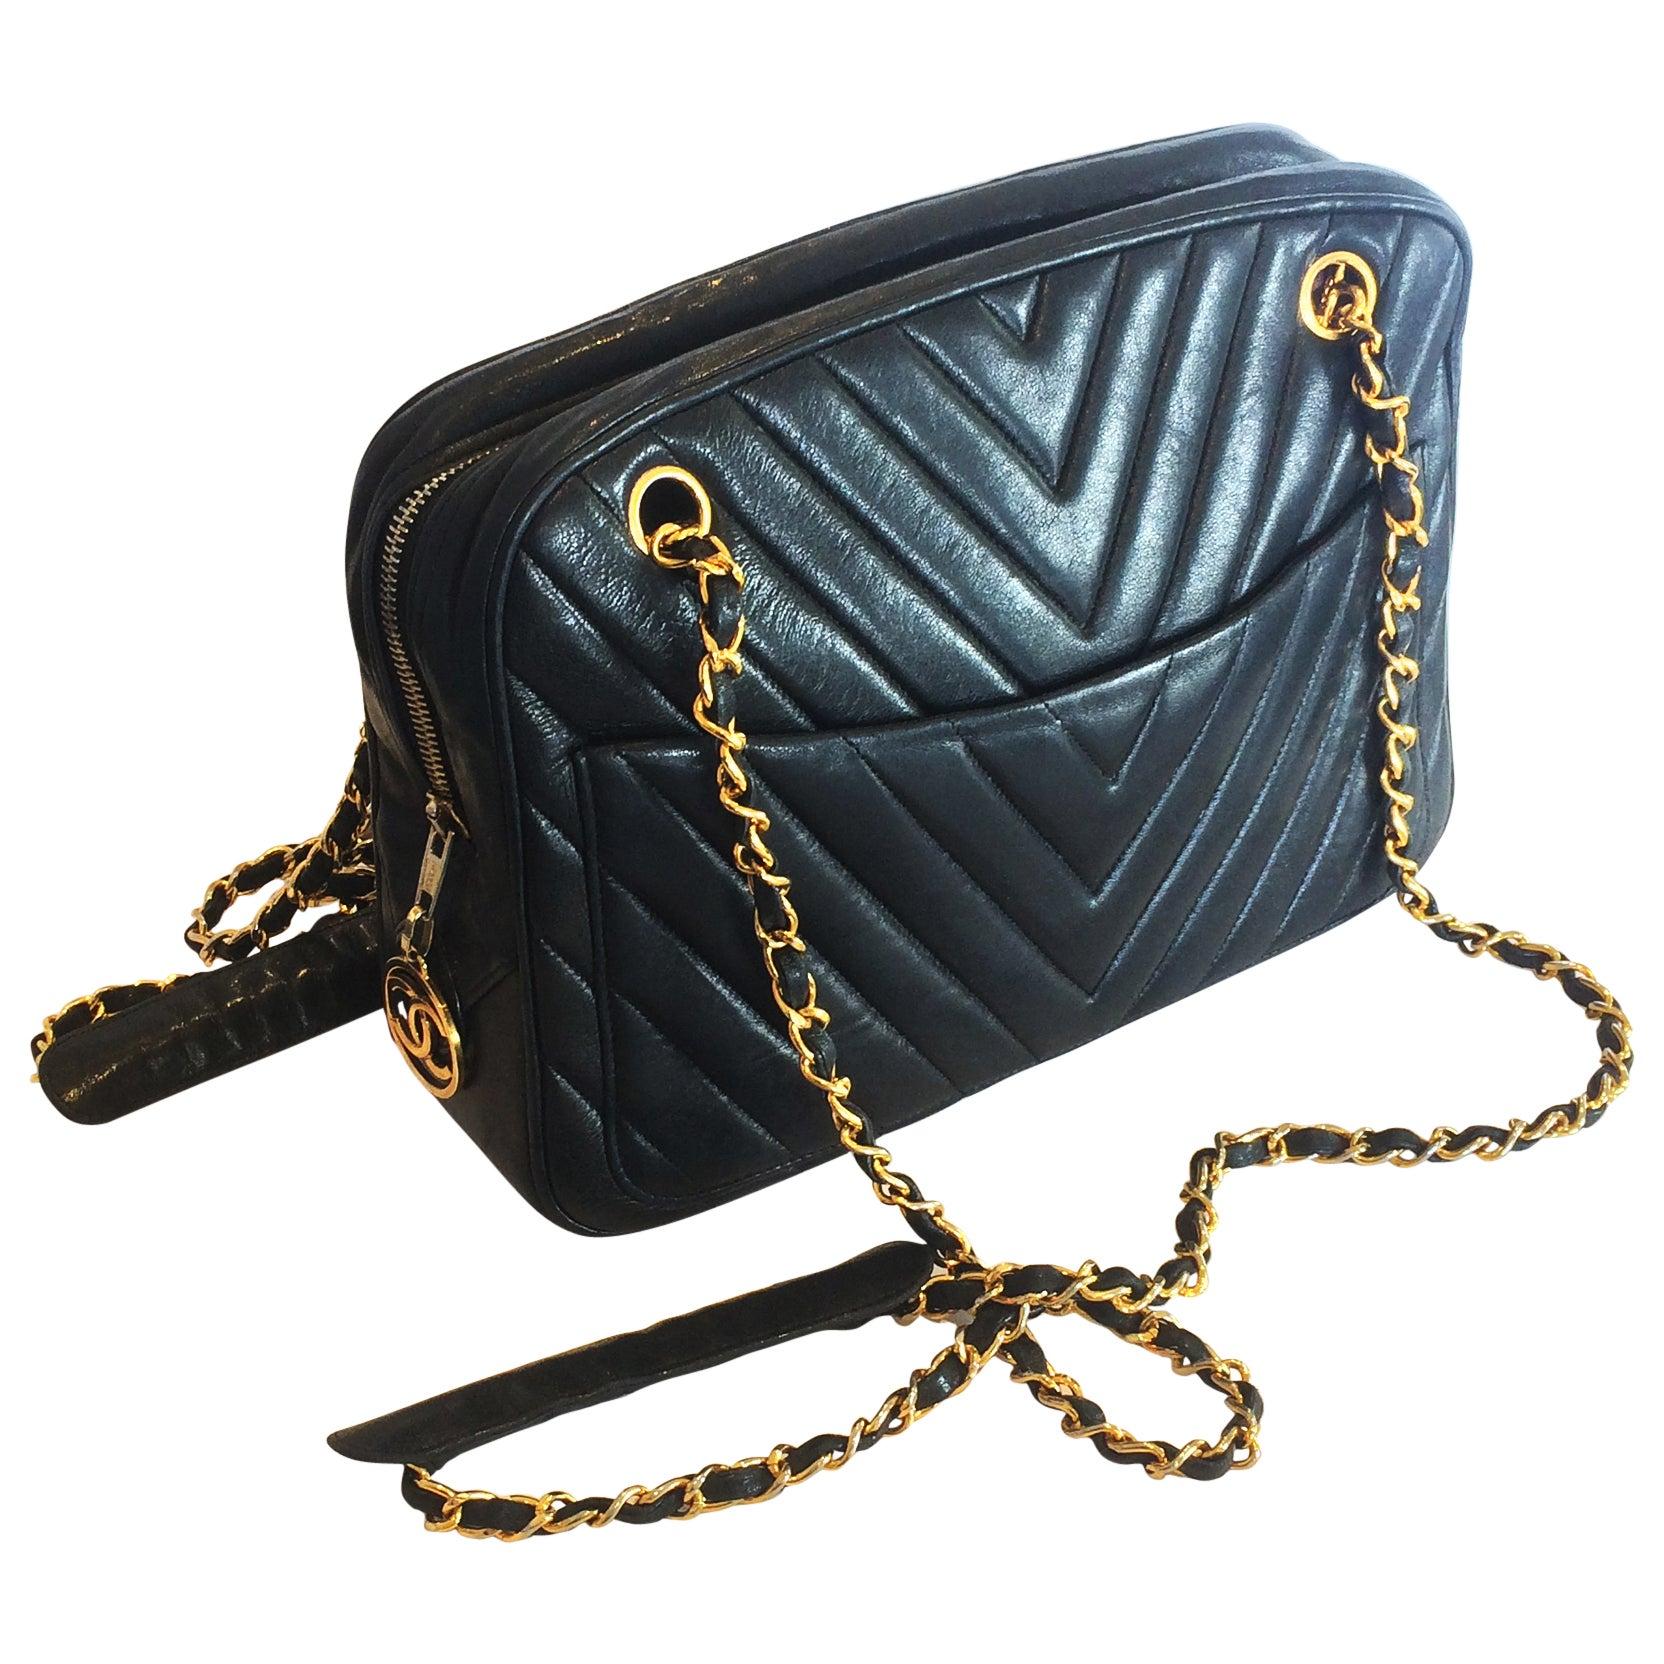 b6ef78cc580068 Authentic Chanel Black V Stitch Handbag Bag at 1stdibs